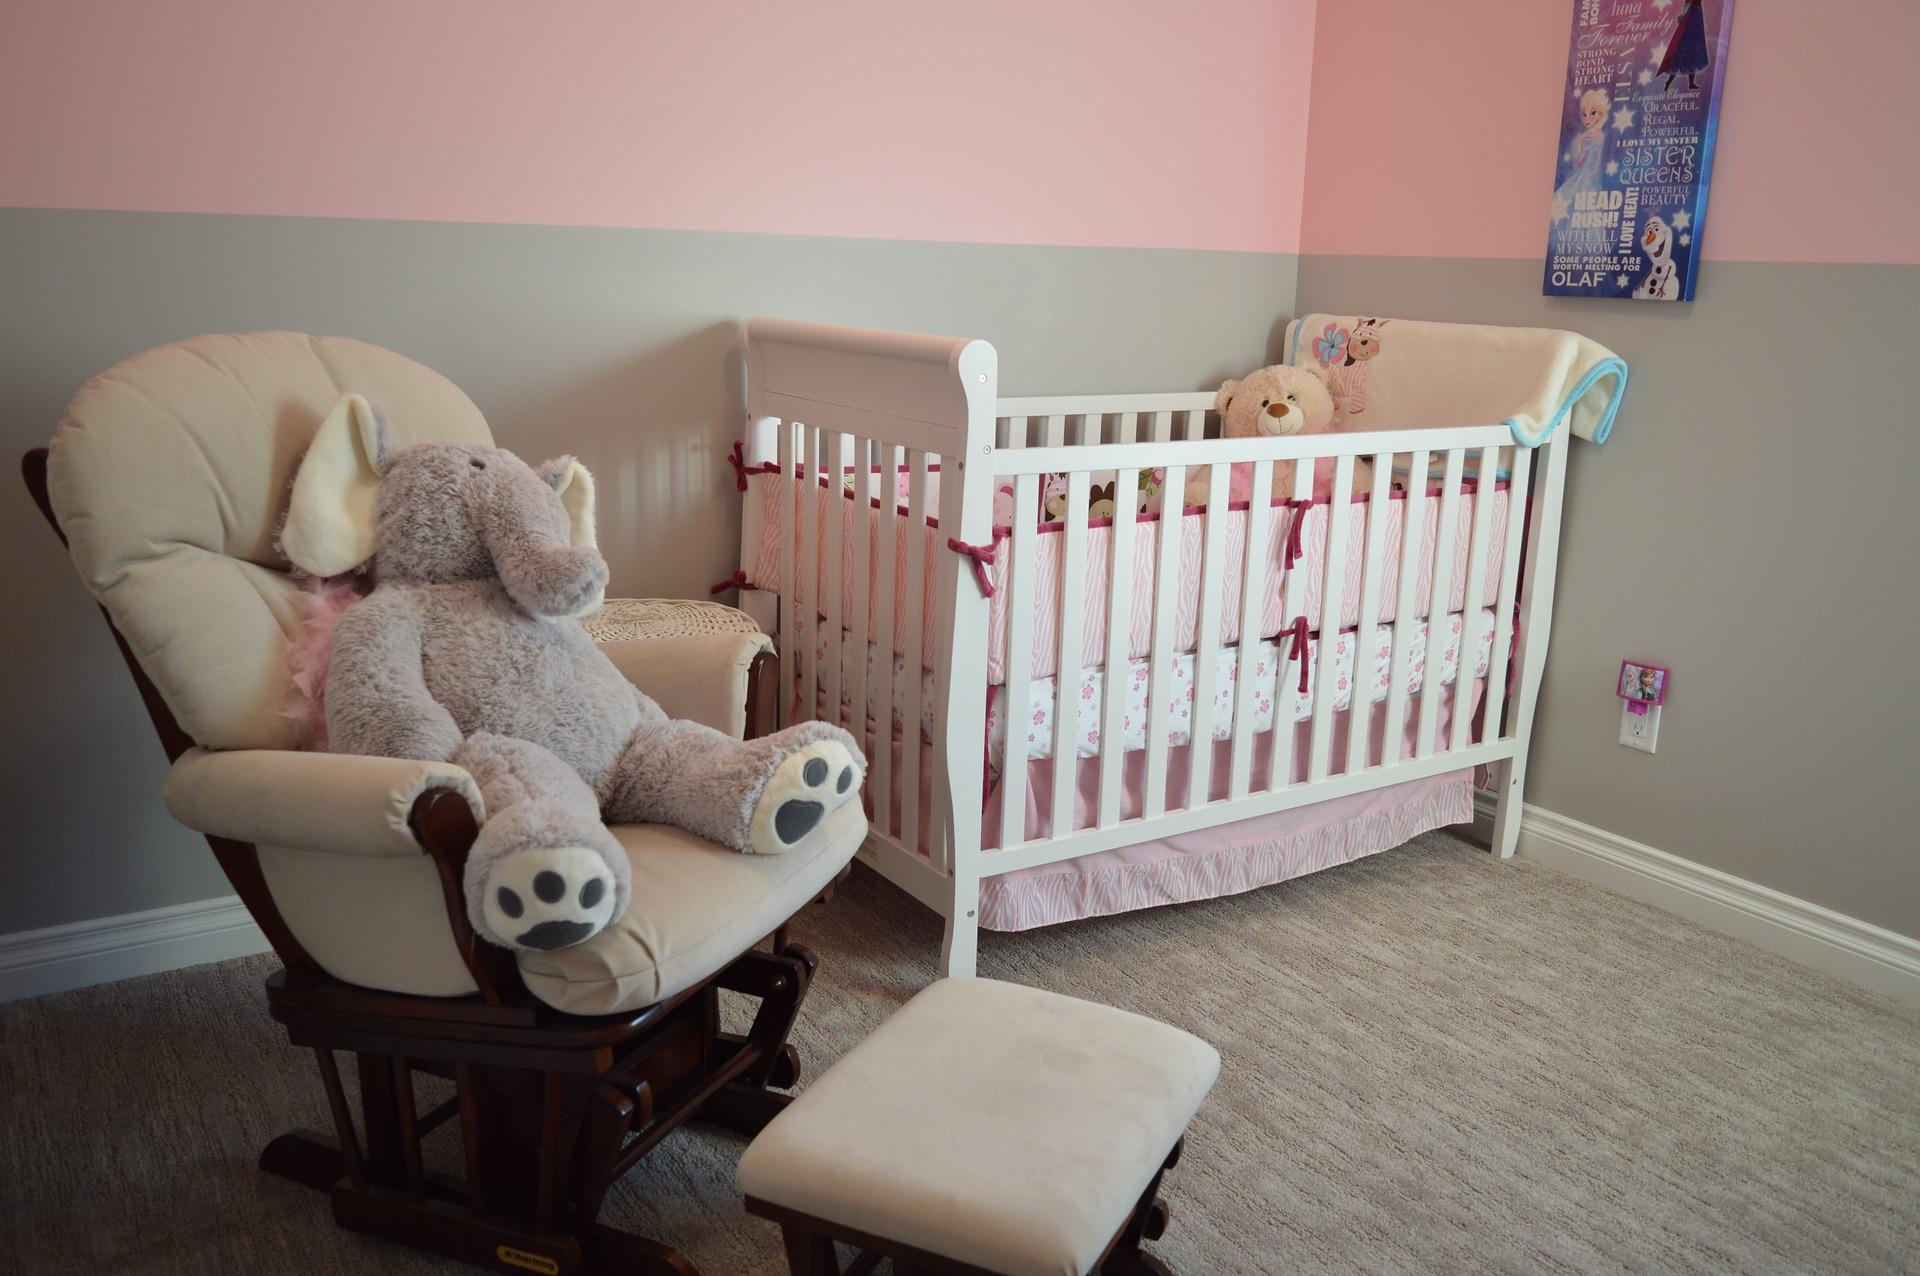 Kinderzimmer Set Komplett Bis 200 Euro Kindermobel Gunstig